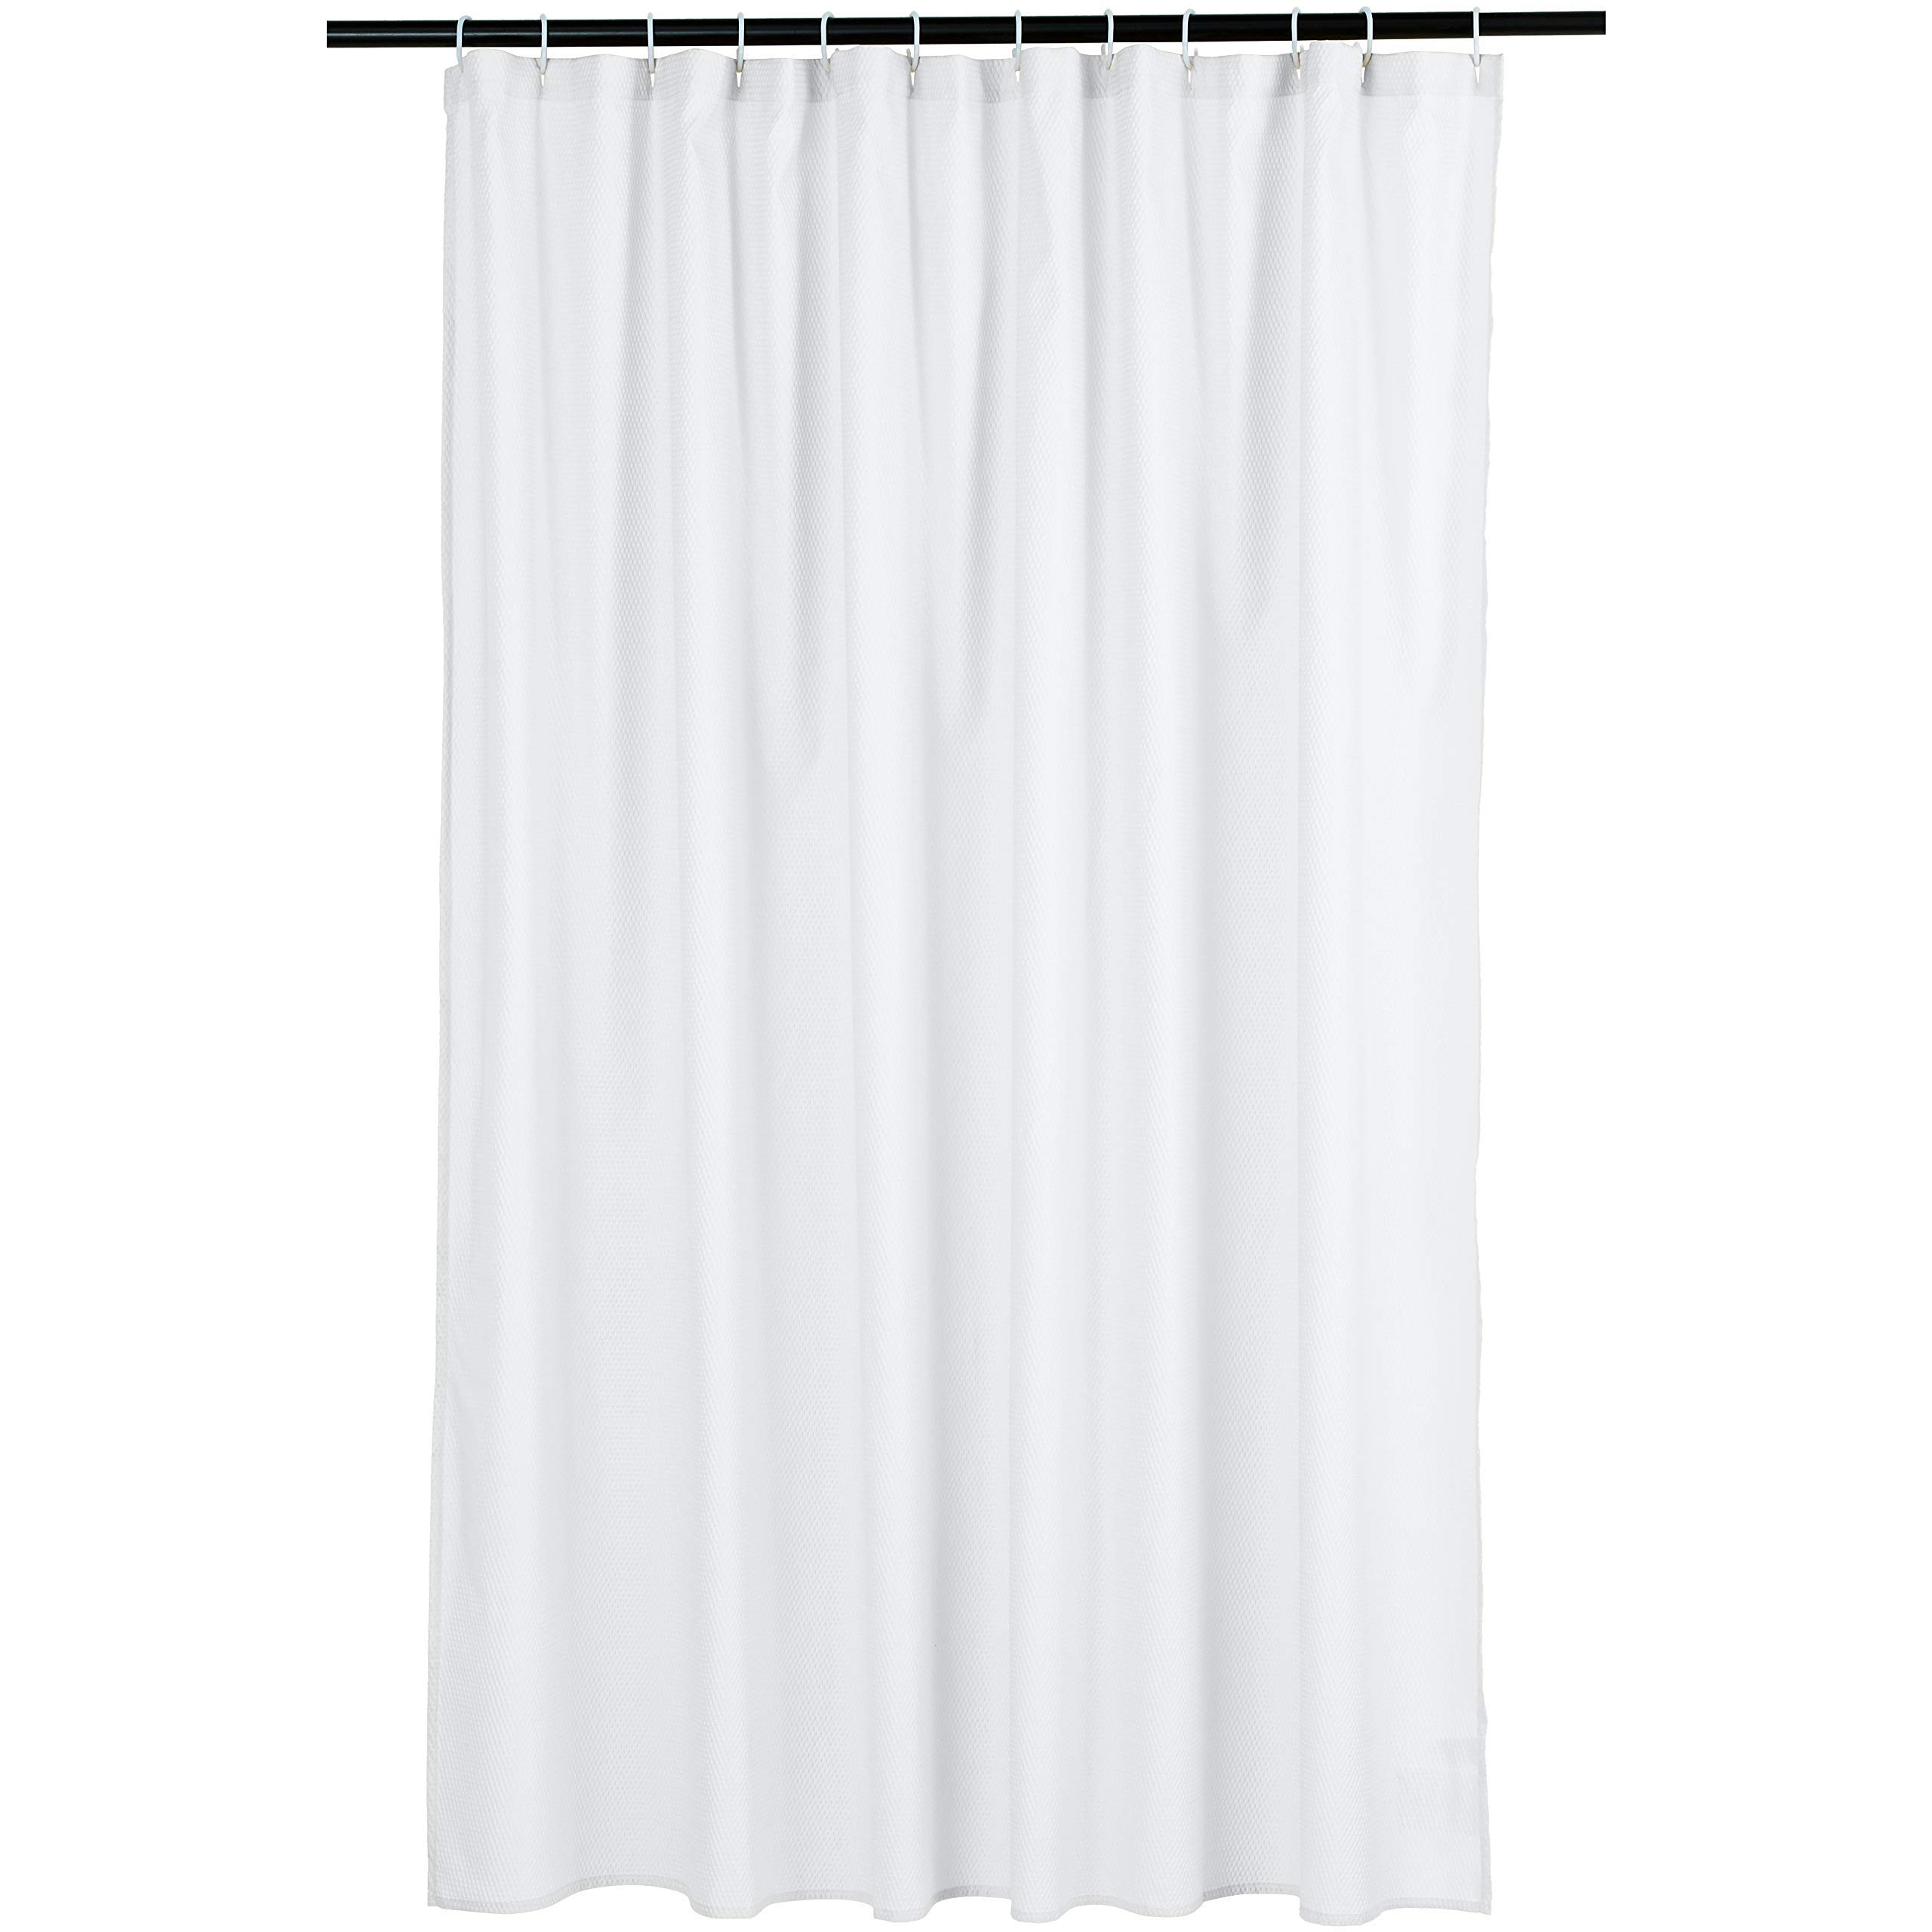 Amazon Basics Waffle Texture Bathroom Shower Curtain - White, 72 Inch